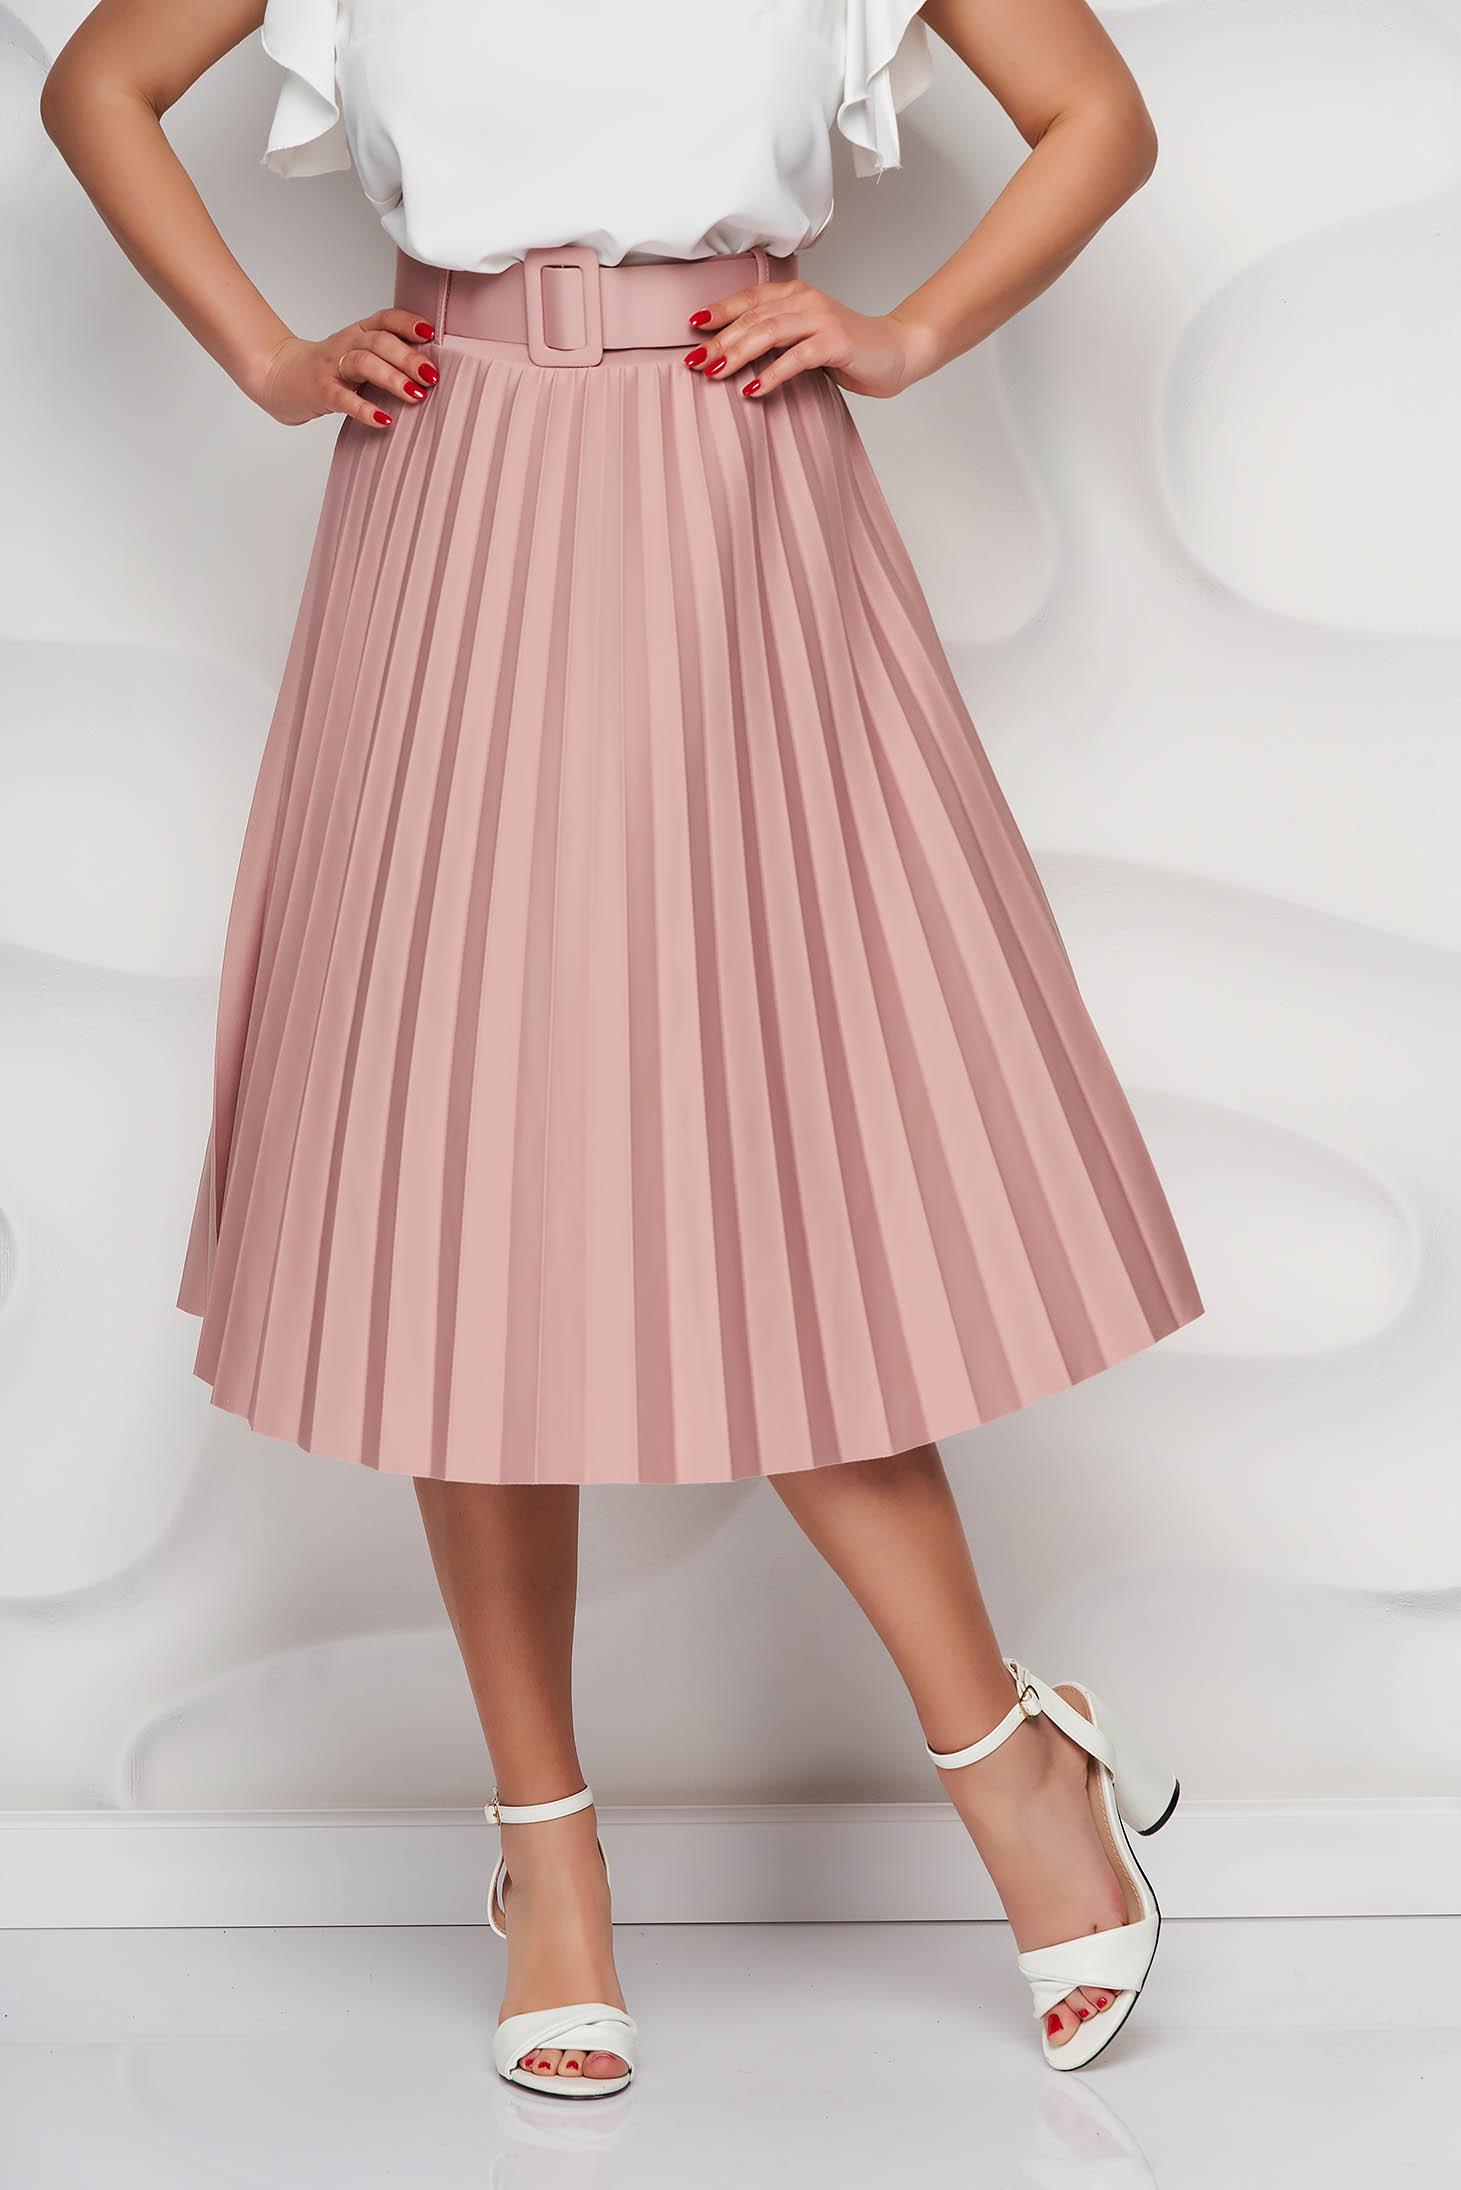 Fusta SunShine roz prafuit plisata in clos din material usor elastic cu accesoriu tip curea